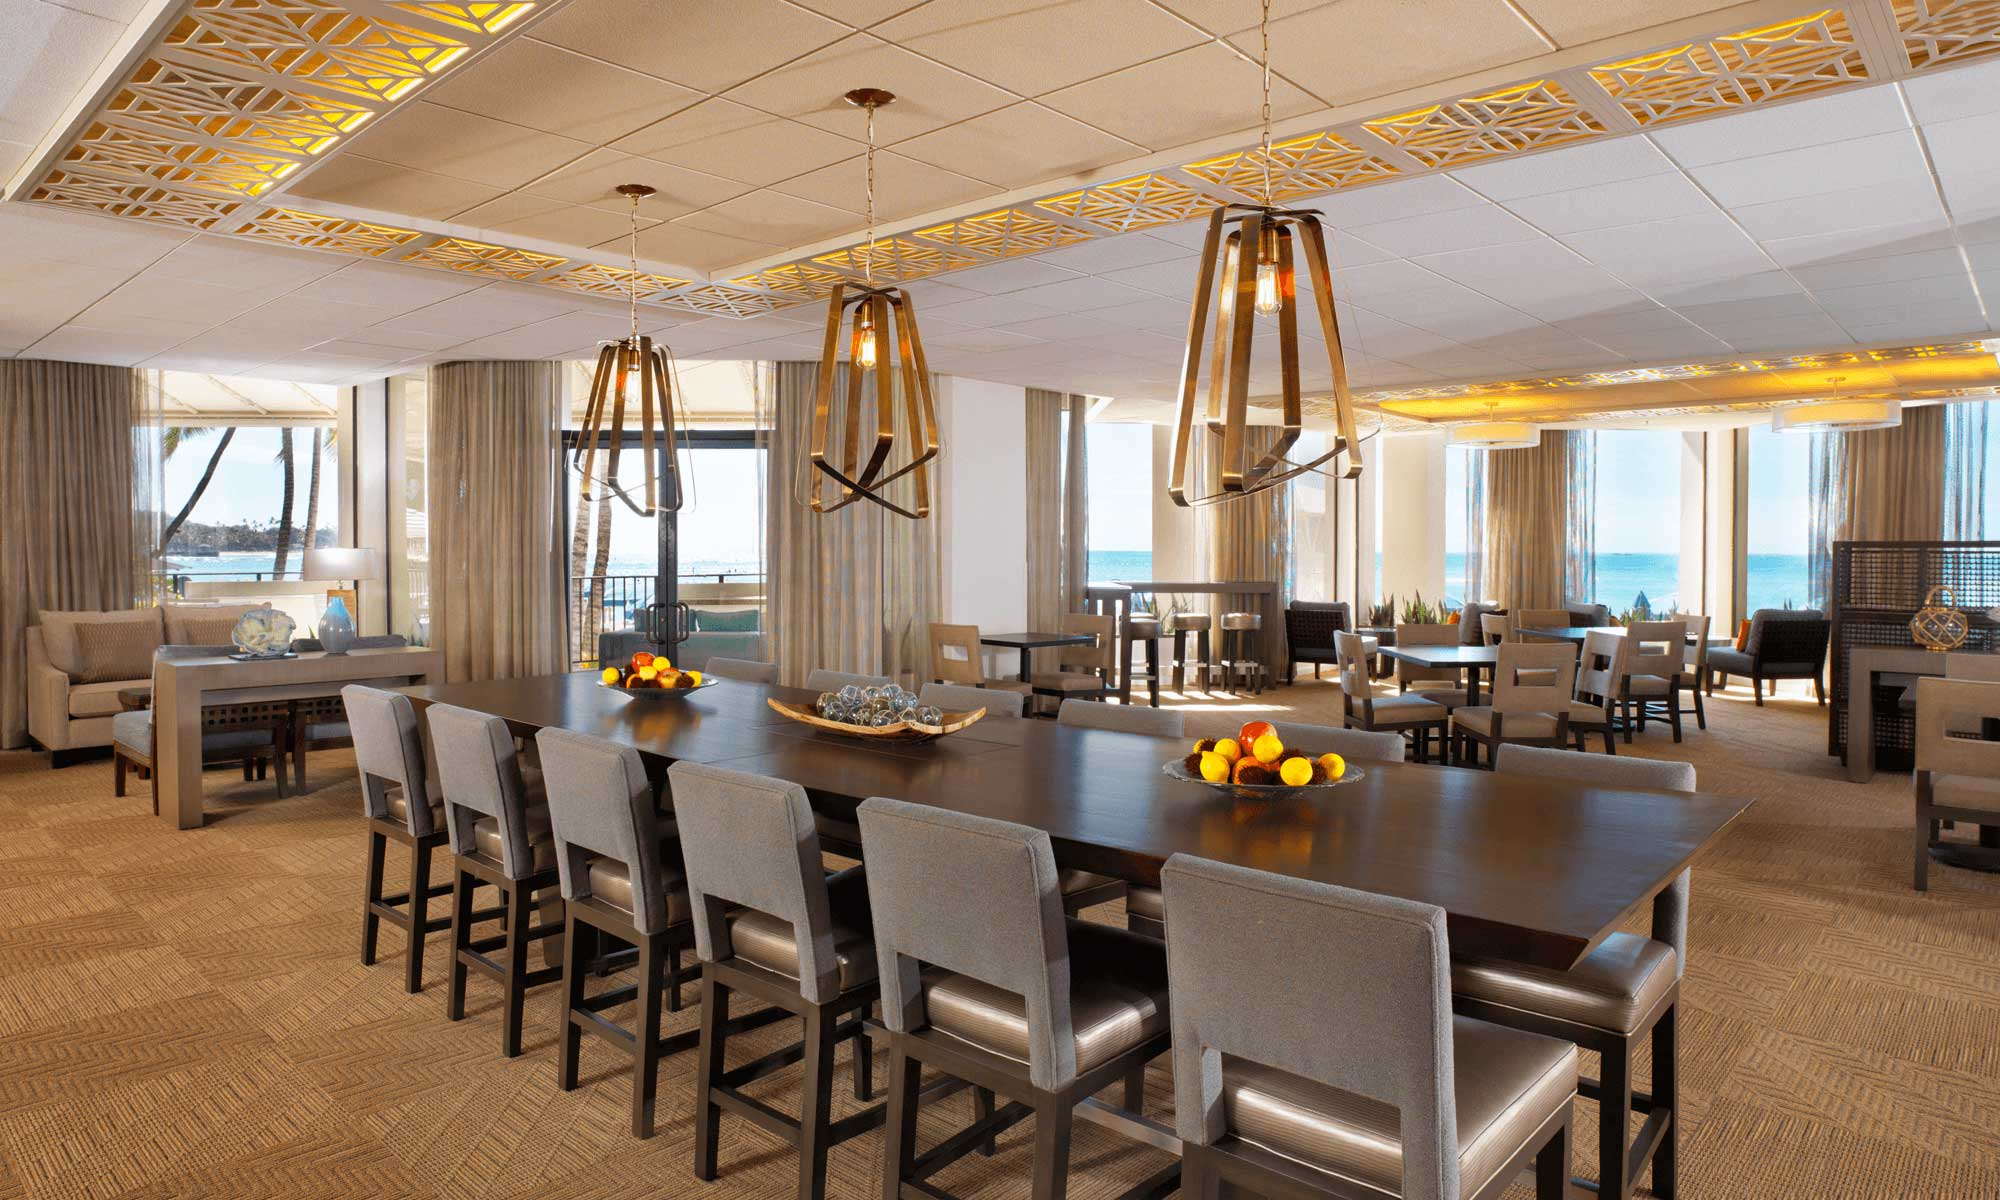 Moana Surfrider Beach Club Architecture, Interior Design, and layout